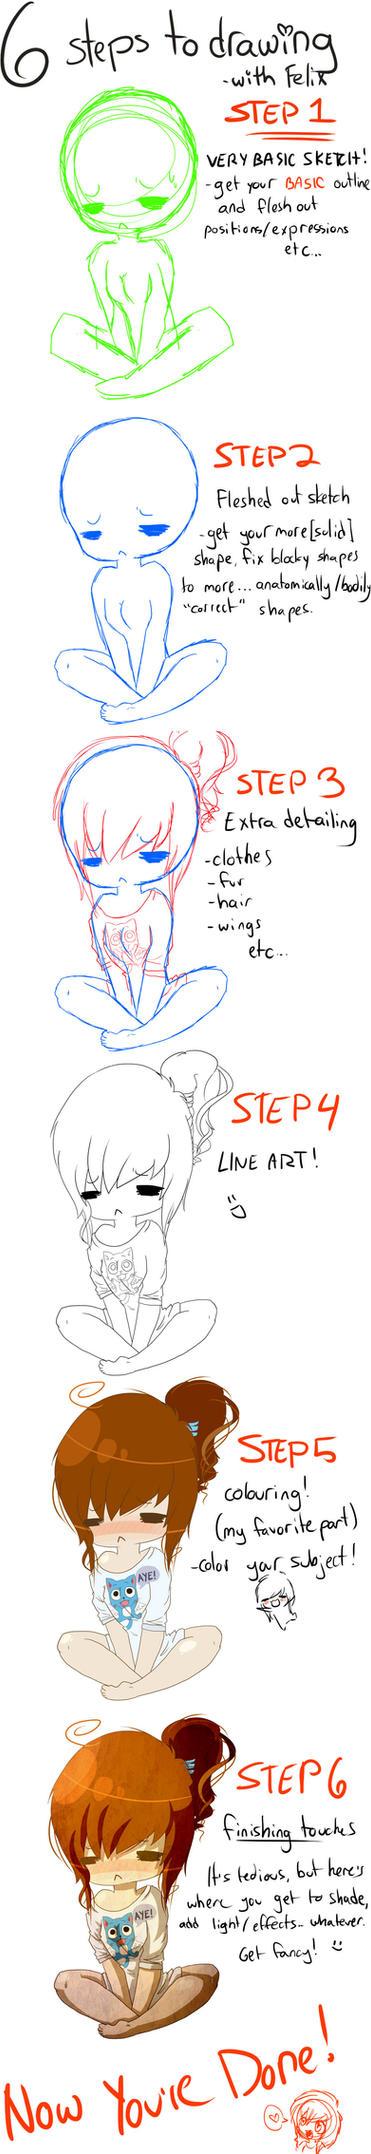 Steps in drawing tutorial by coffaefox